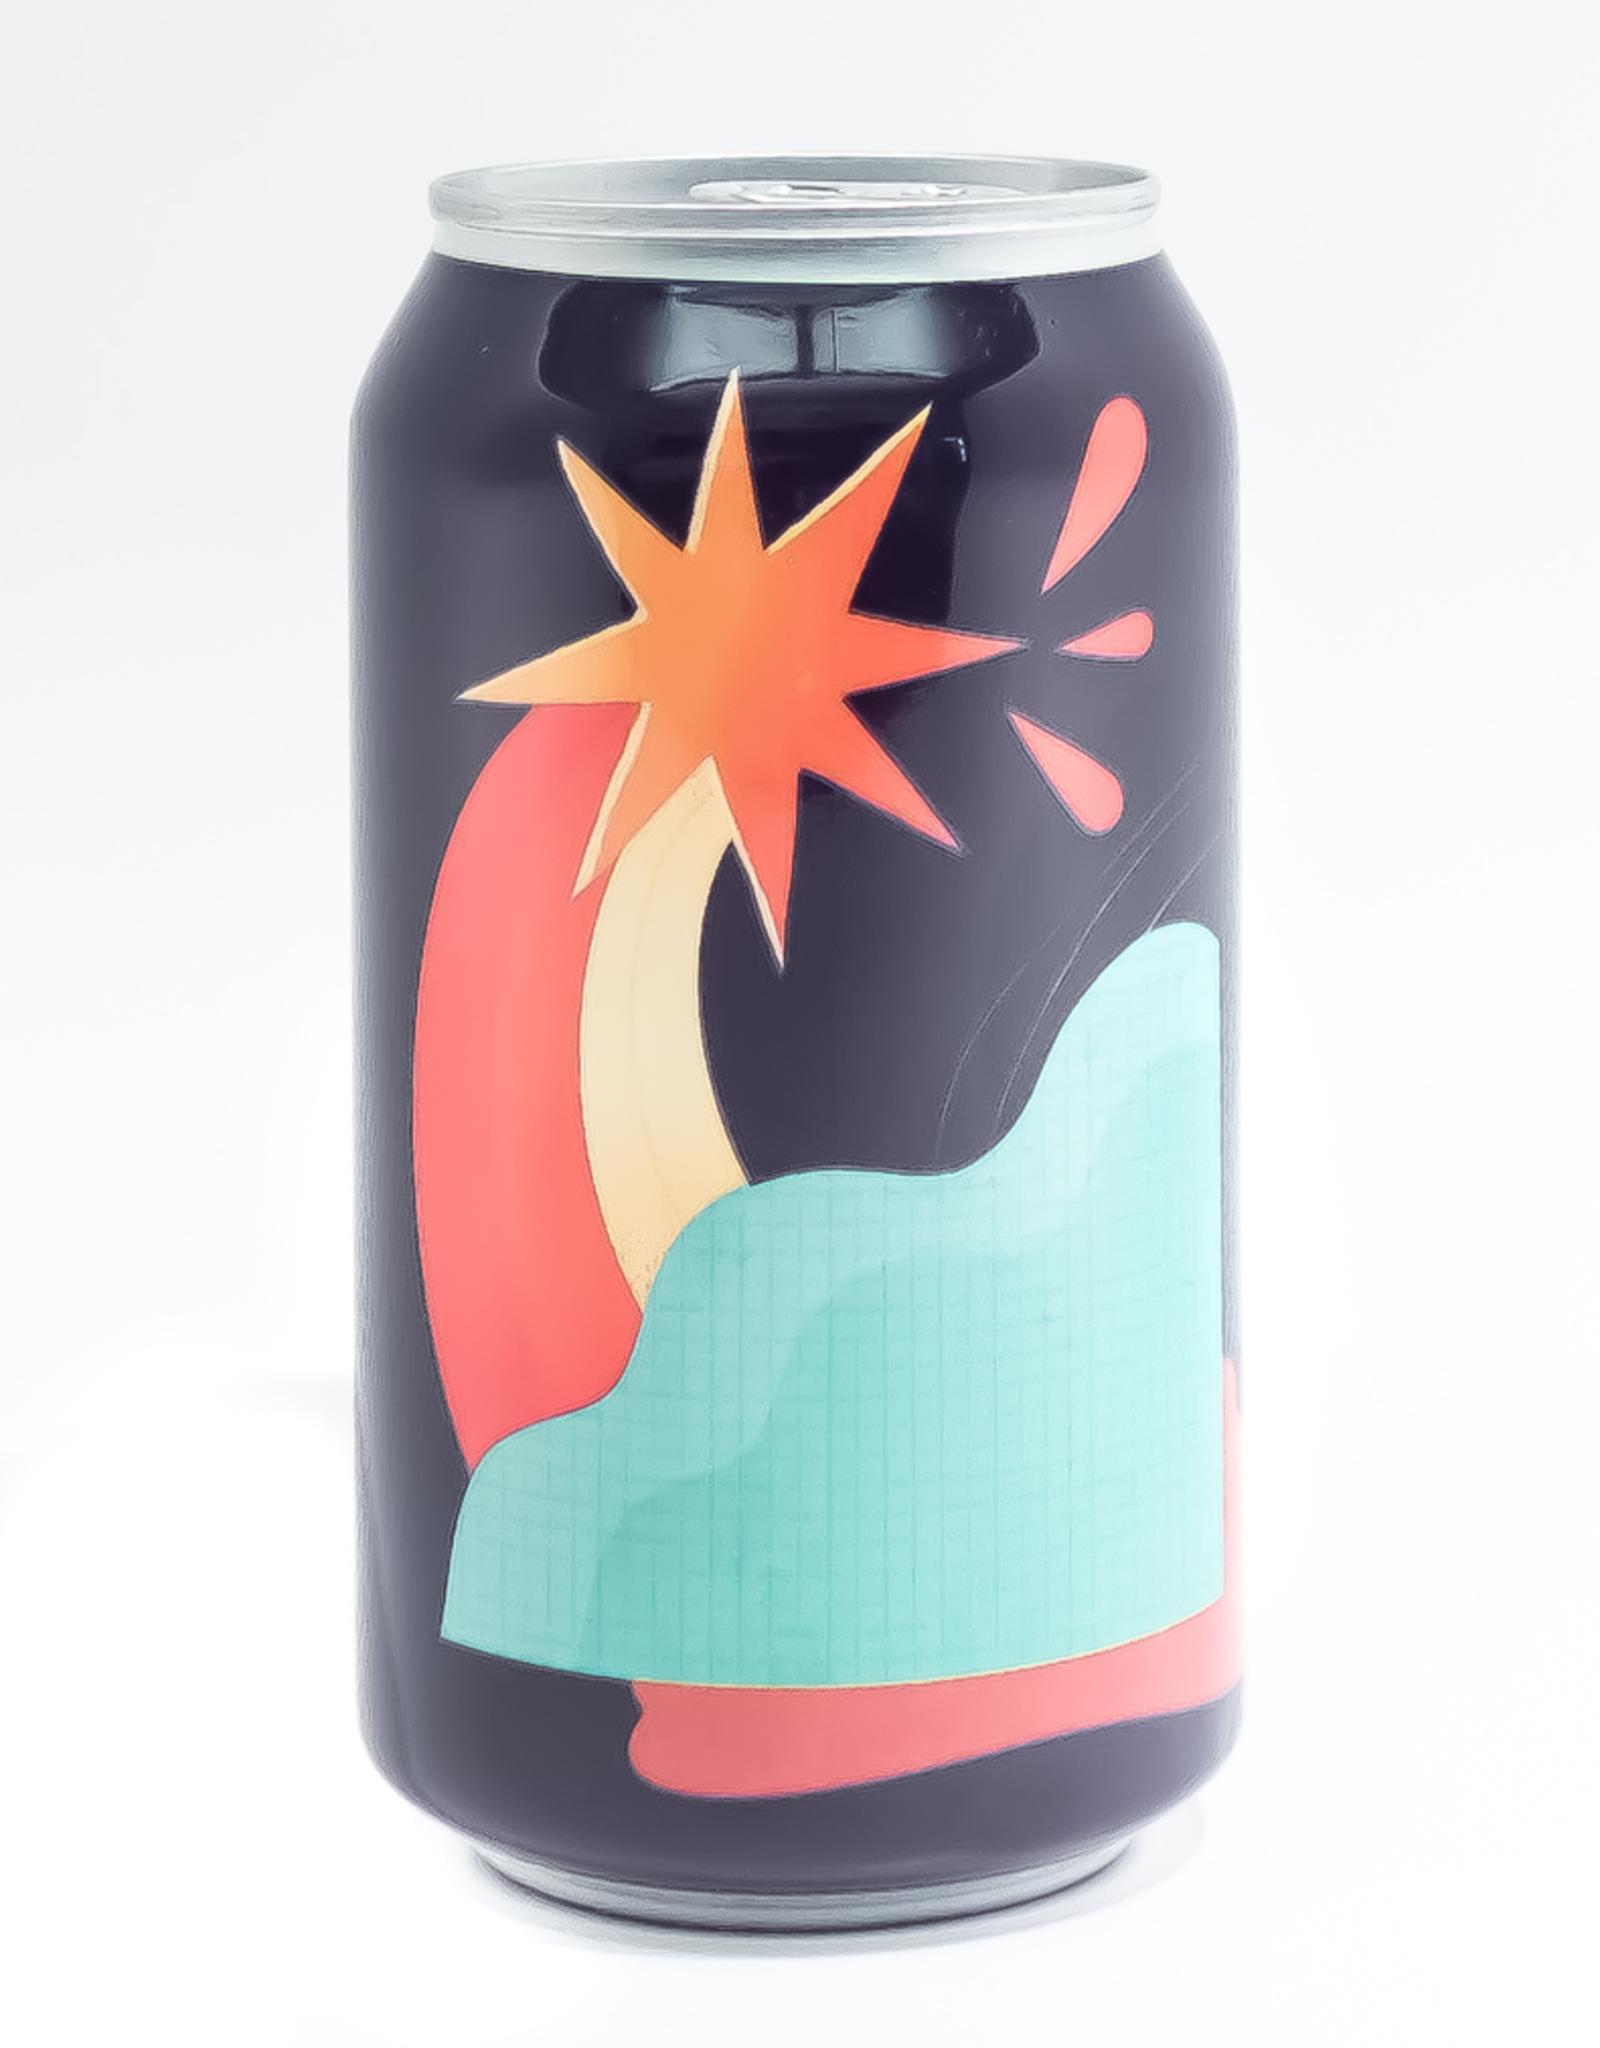 Spirits-Ready to Drink Collective Arts Gin Soda Grapefruit Lemon Thyme